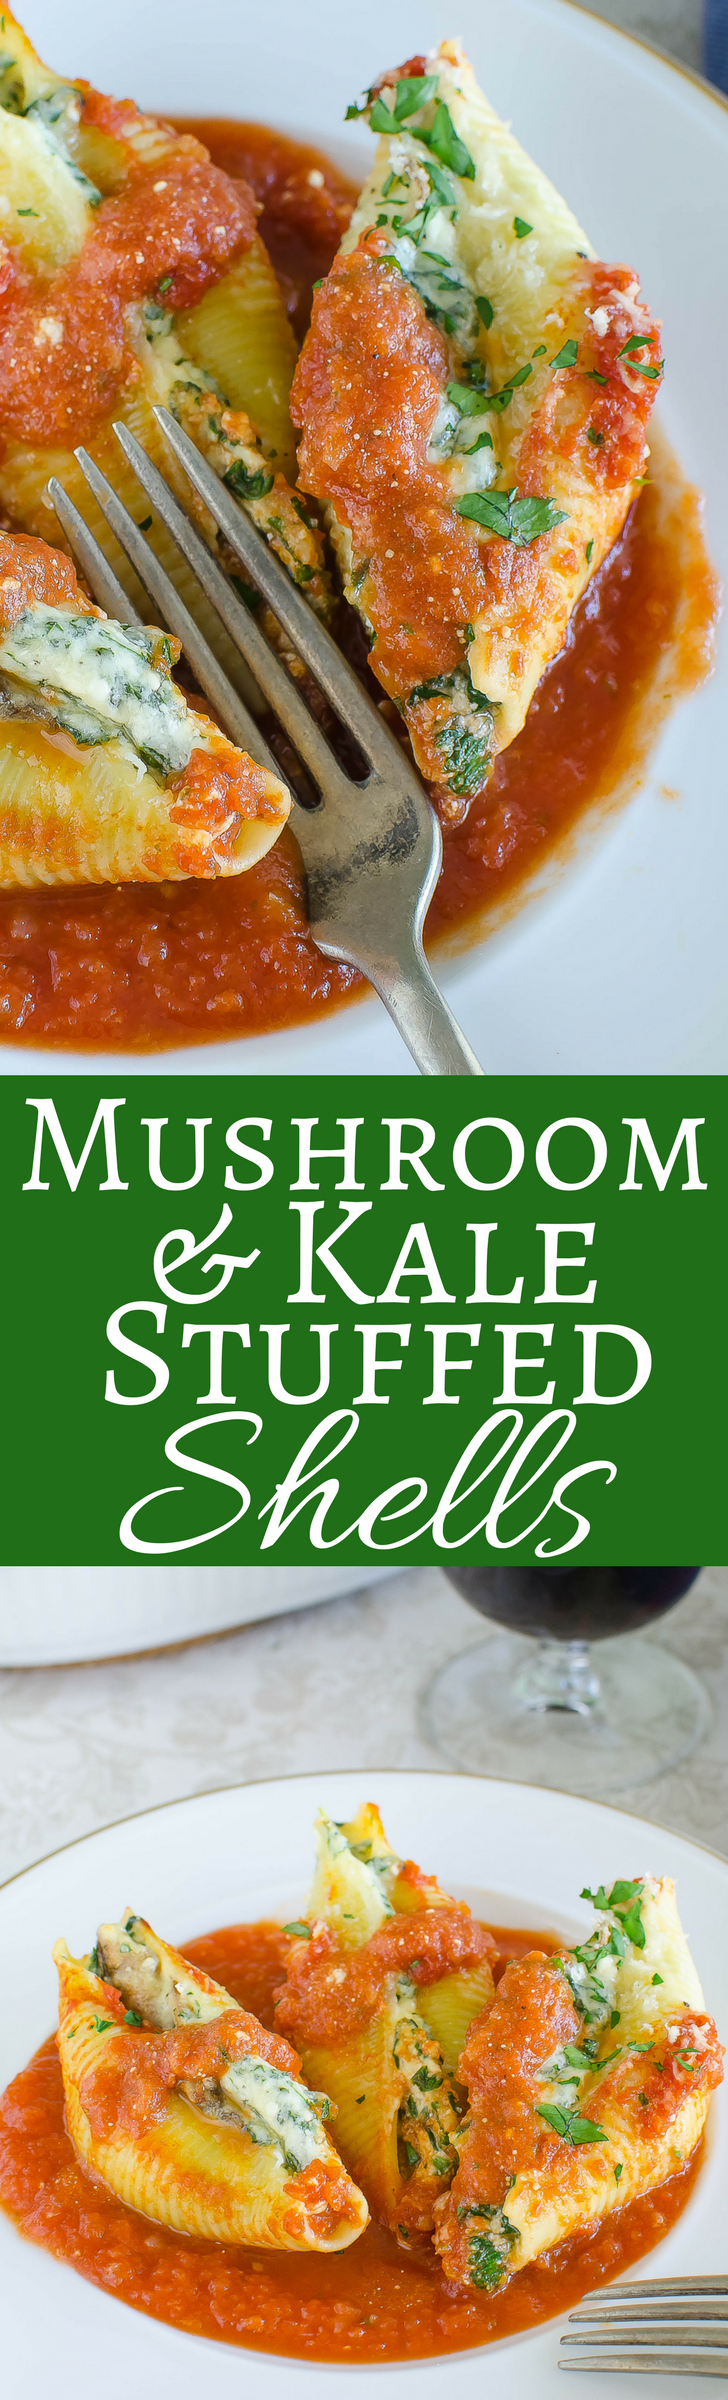 If you love stuffed shells, you'll love this recipe for Mushroom Kale Stuffed Shells!  The ultimate Italian comfort food!